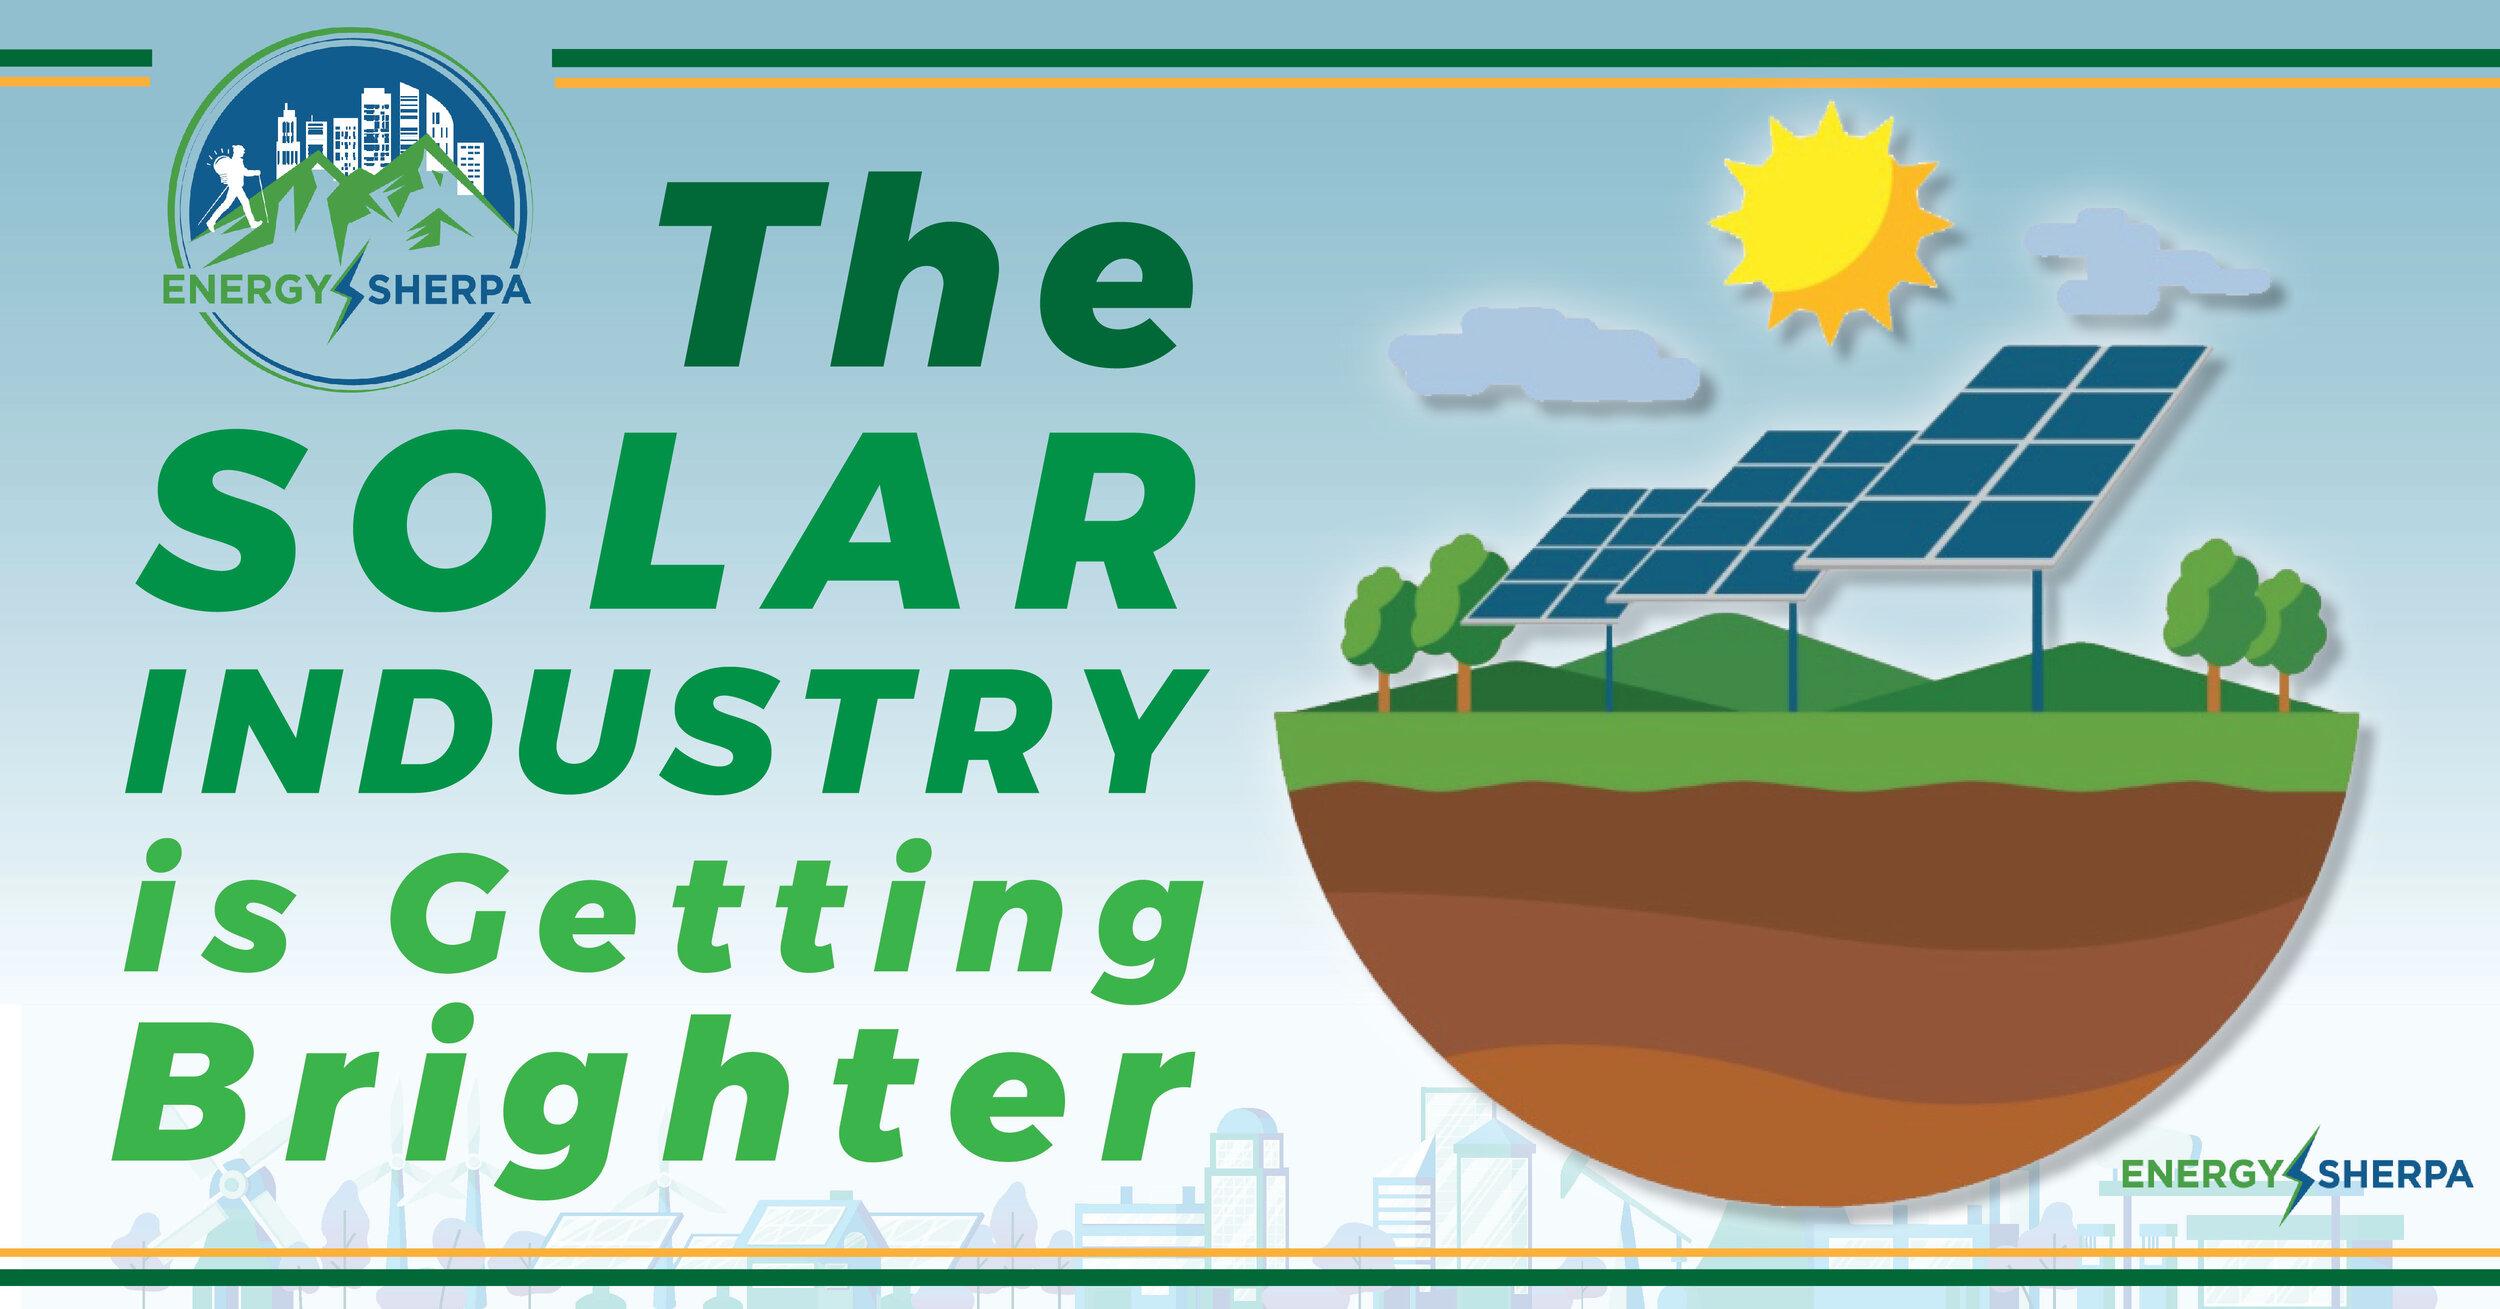 The_Solar_Industry.jpg